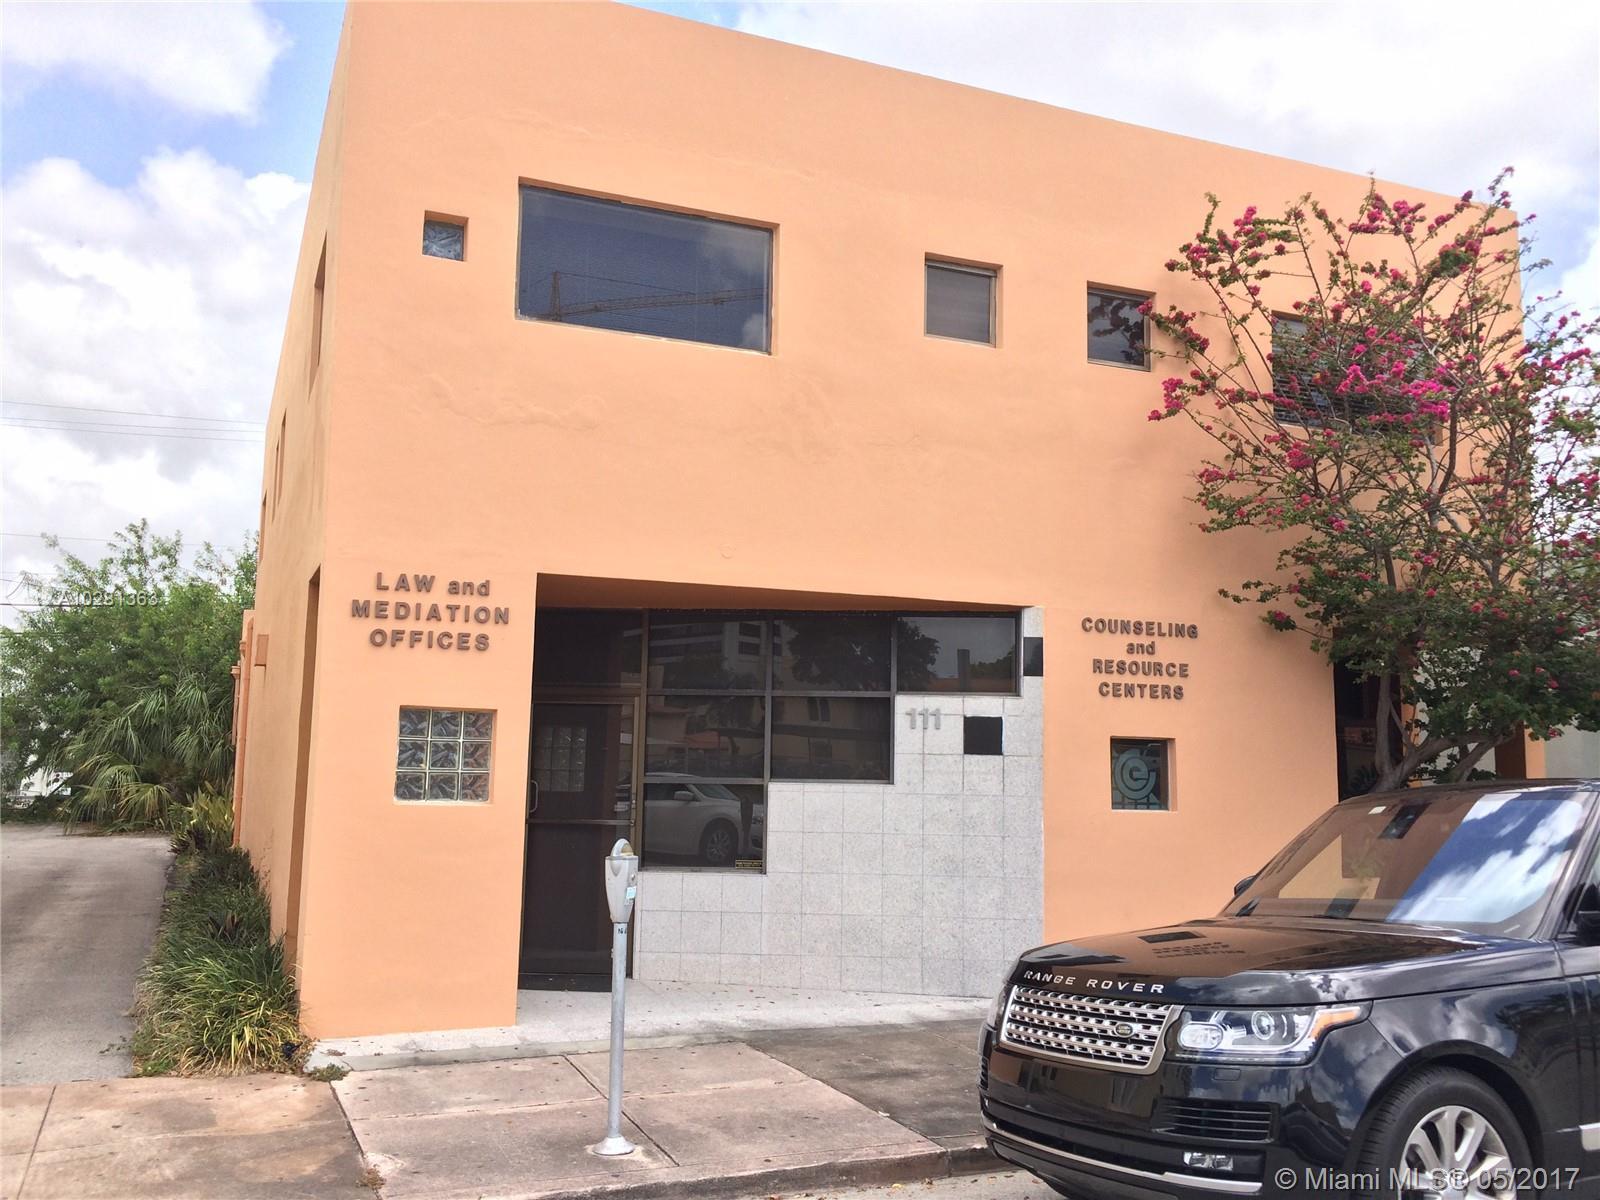 111 Majorca Ave # 2nd fl, Coral Gables, FL 33134